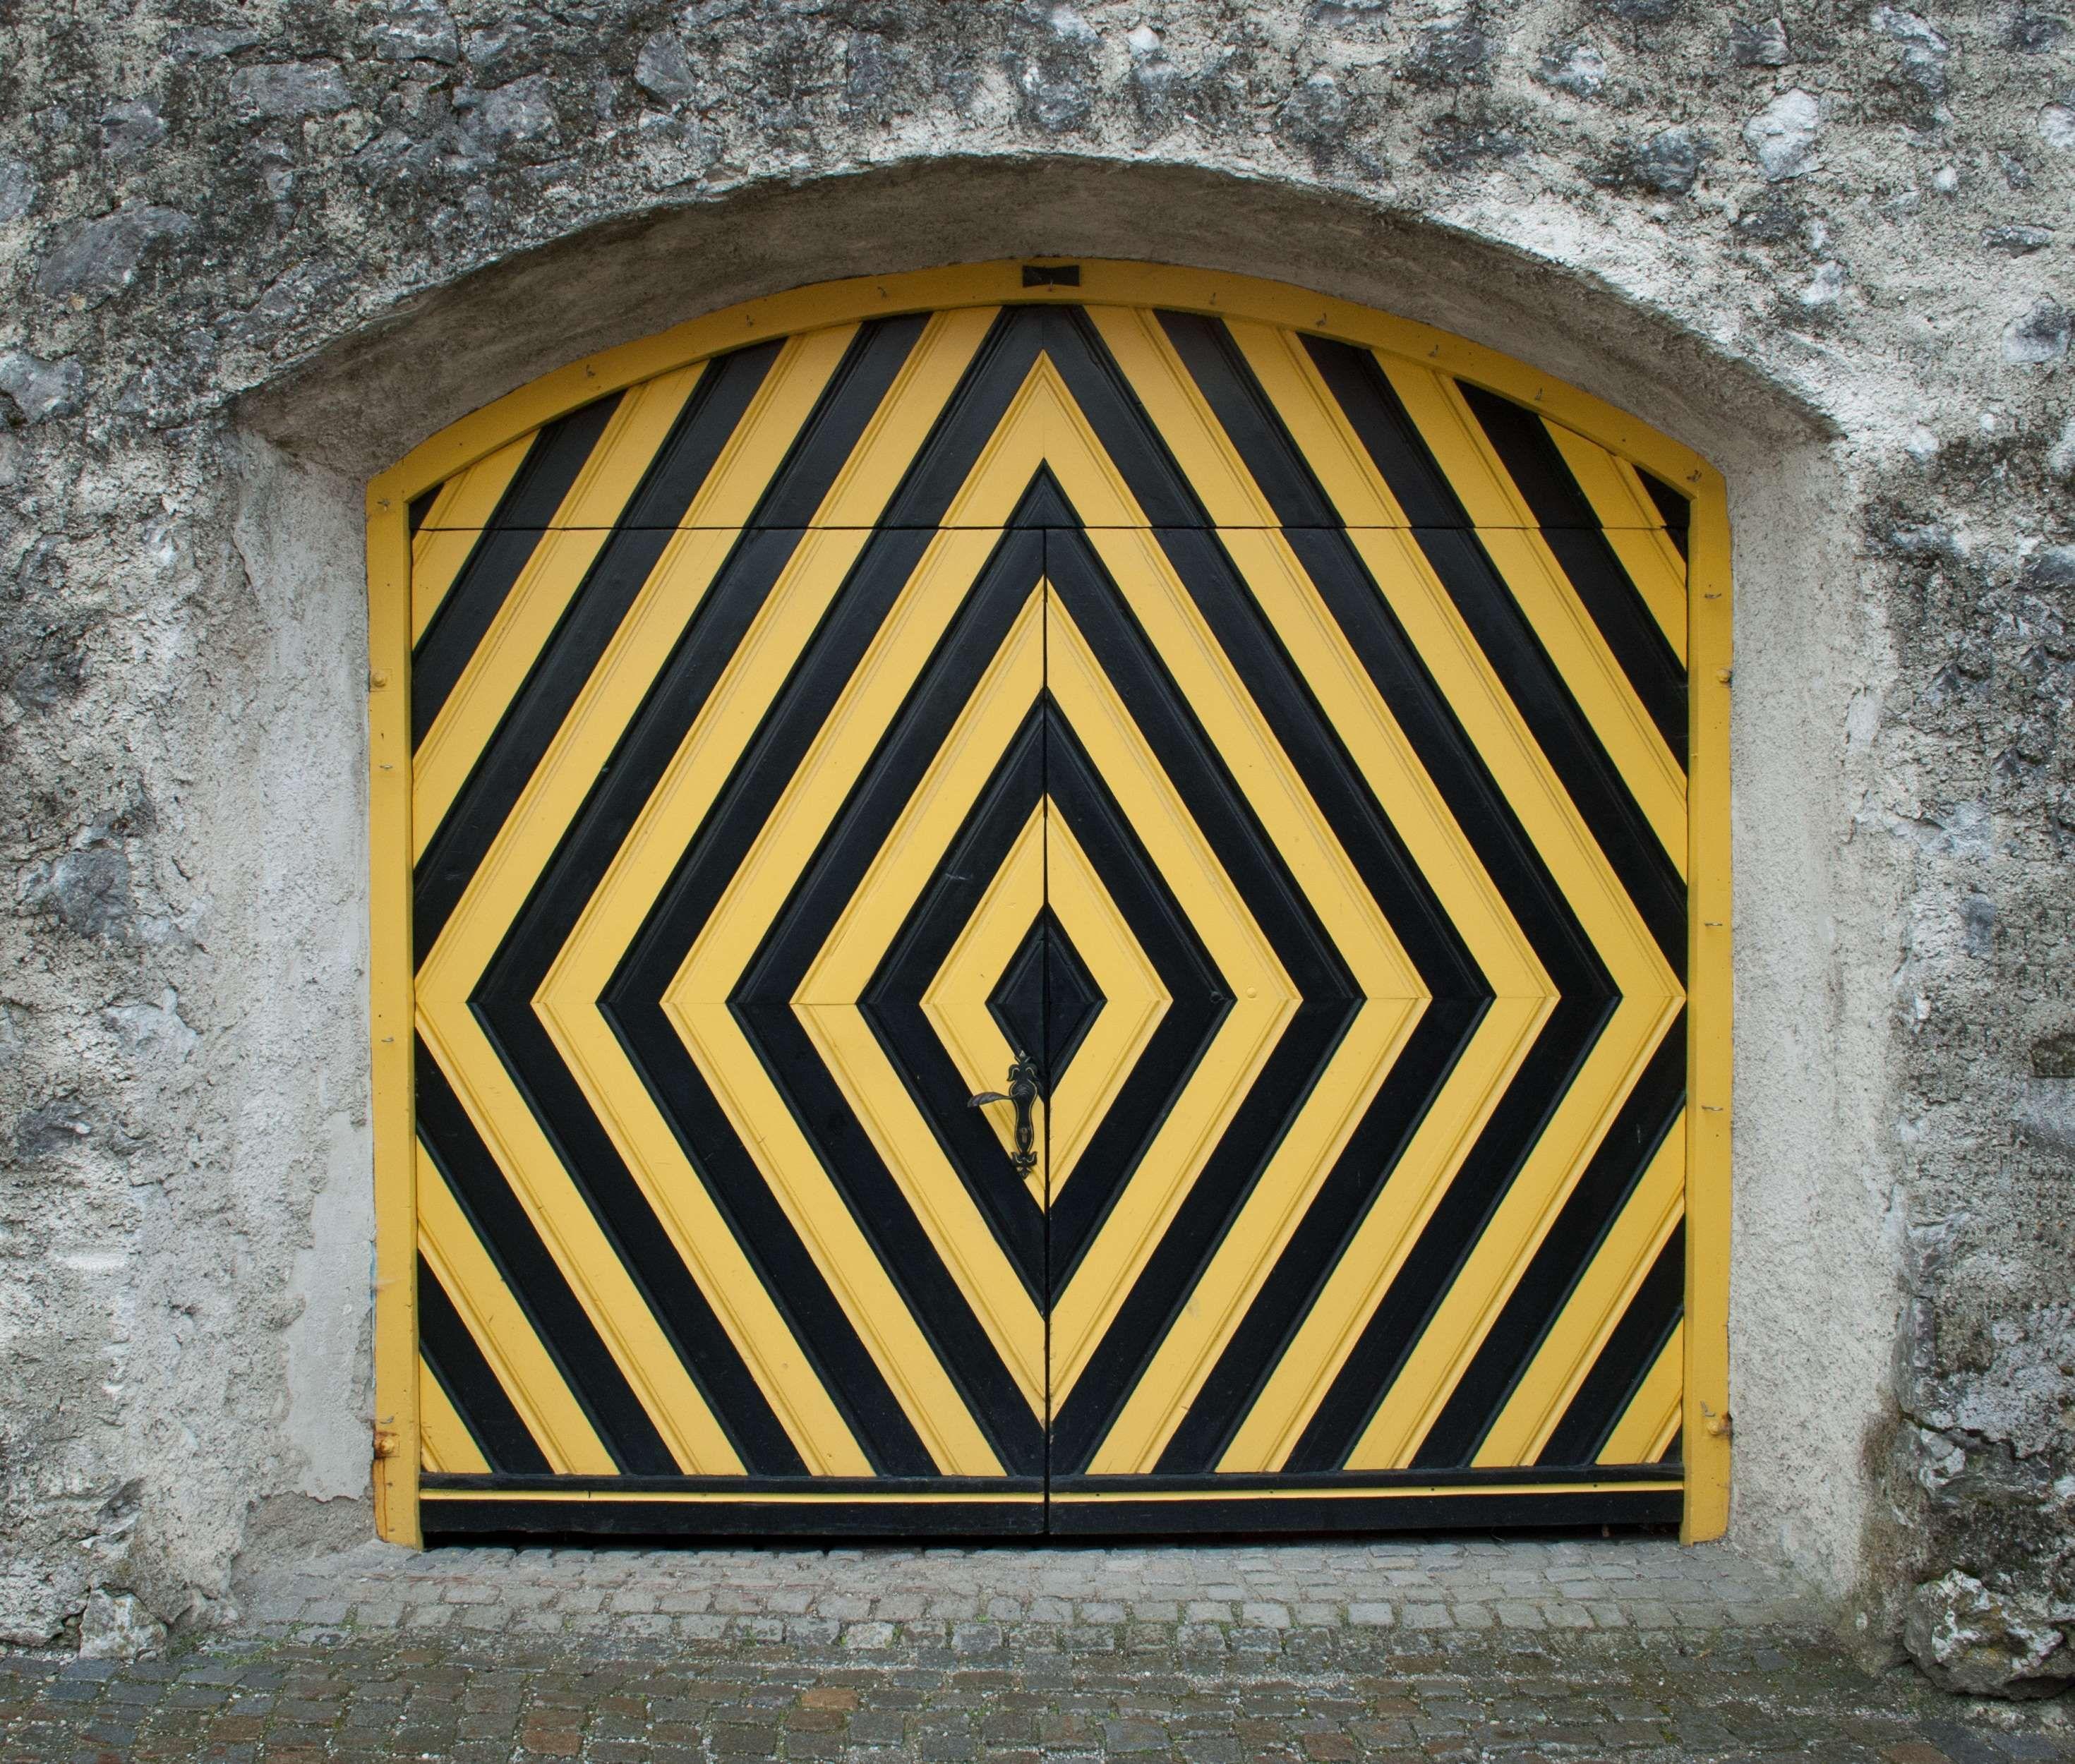 abstract #architecture #art #black #building #castle #close #design ...